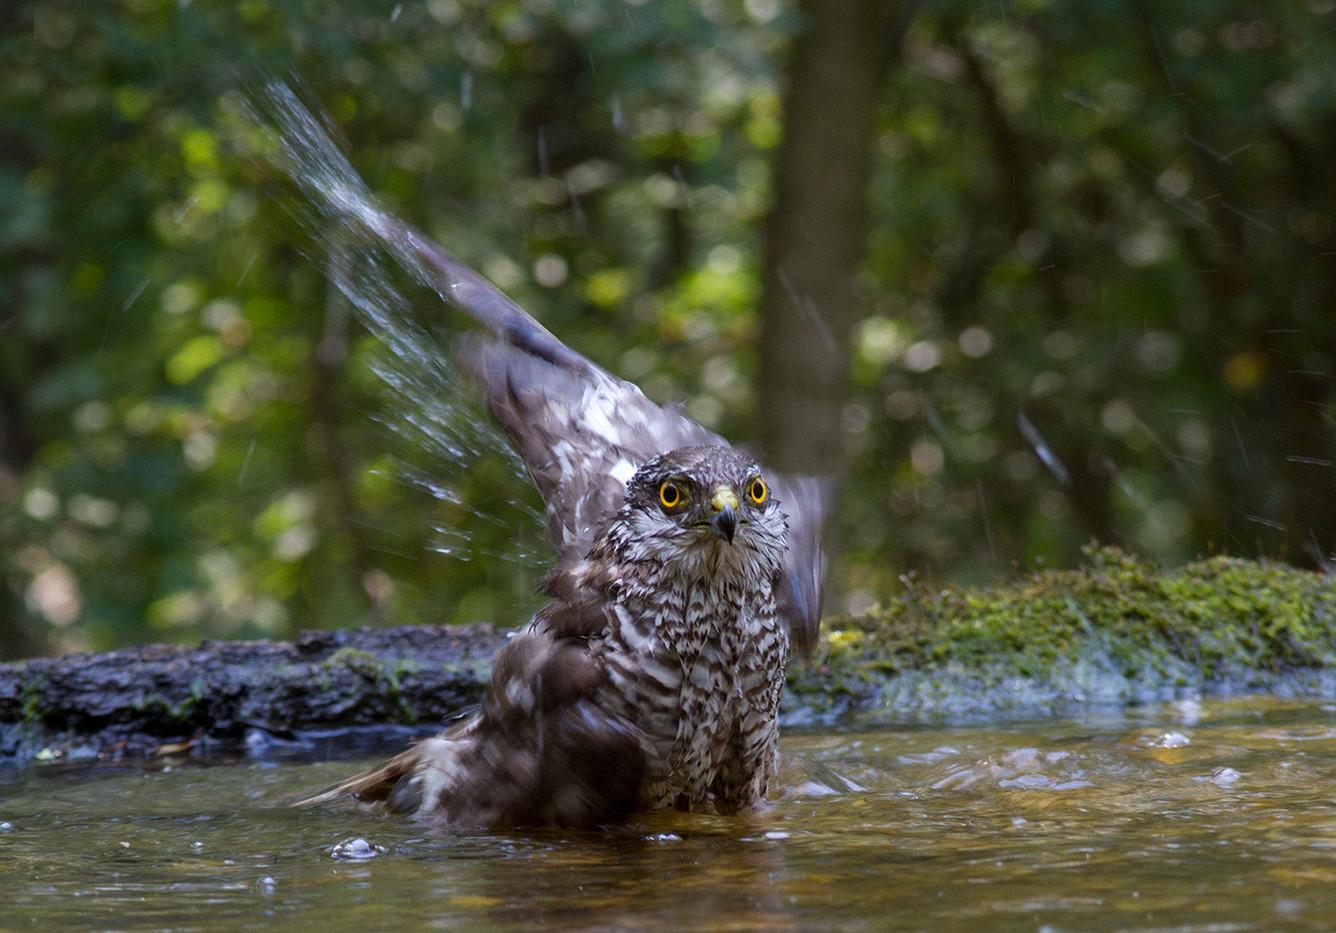 GROUP 1 19 SPARROWHAWK TAKING A BATH by John Hunt